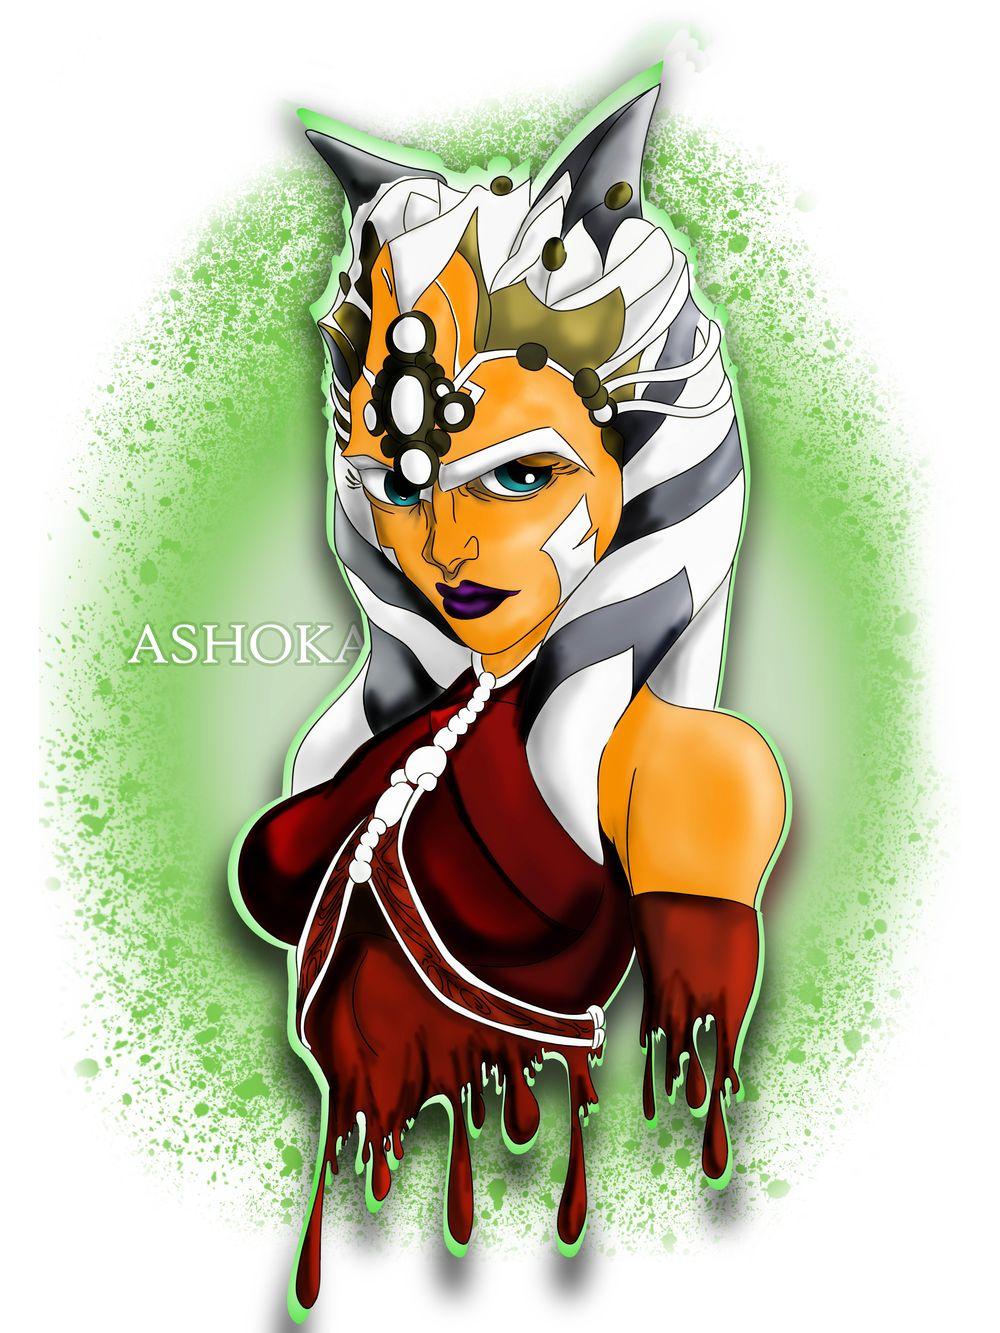 Ashoka Digital Art - image 1 - student project